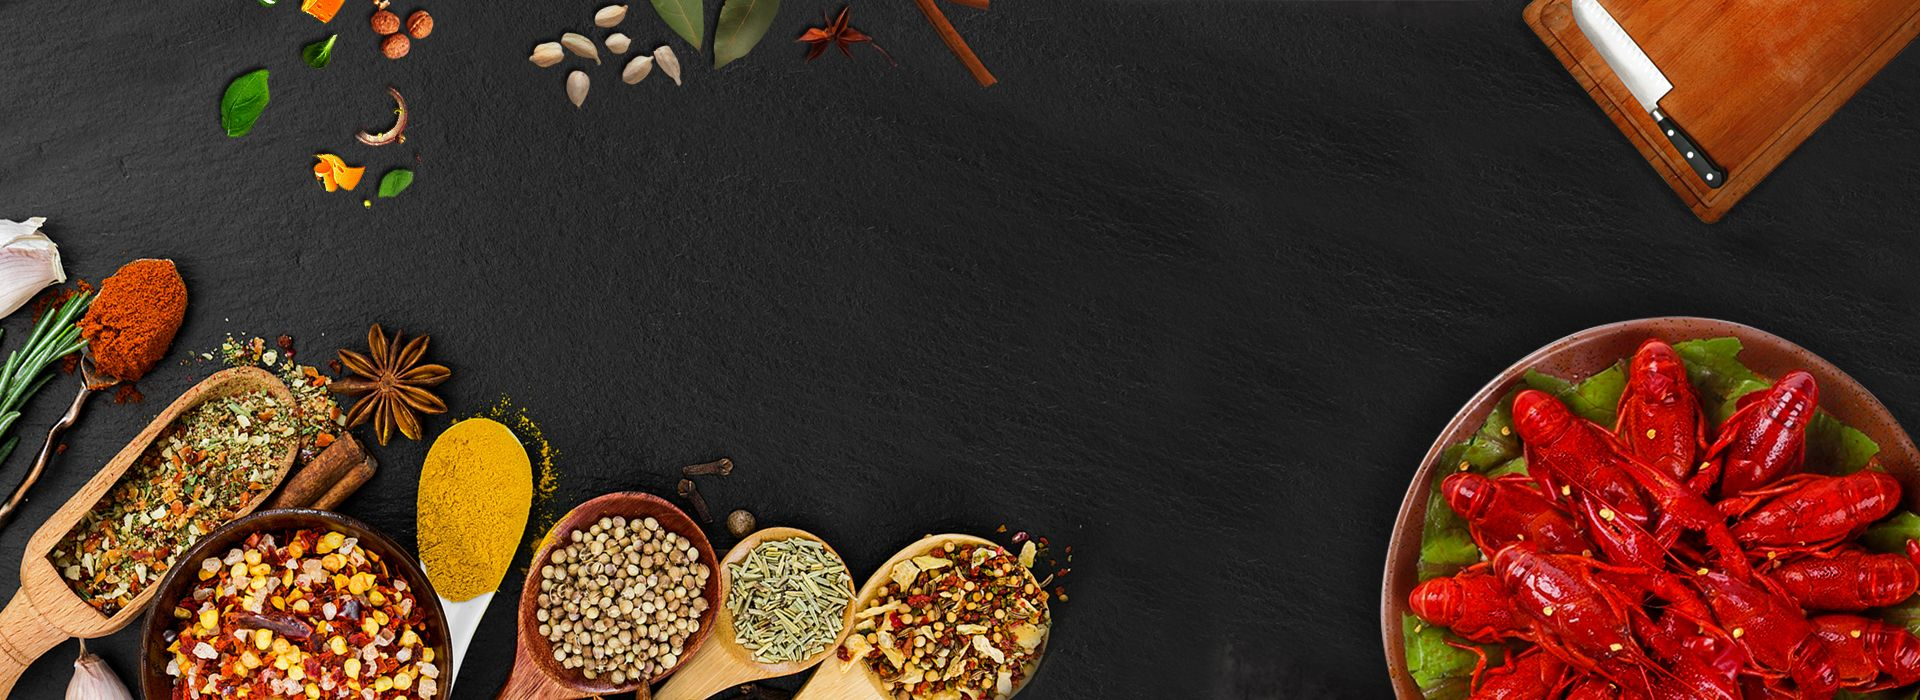 Crayfish Food Food Condiment Black Horizontal Banner Goods Seasoning Black Horizontal Banner Delicious Food Poster Food Banner Food Backgrounds